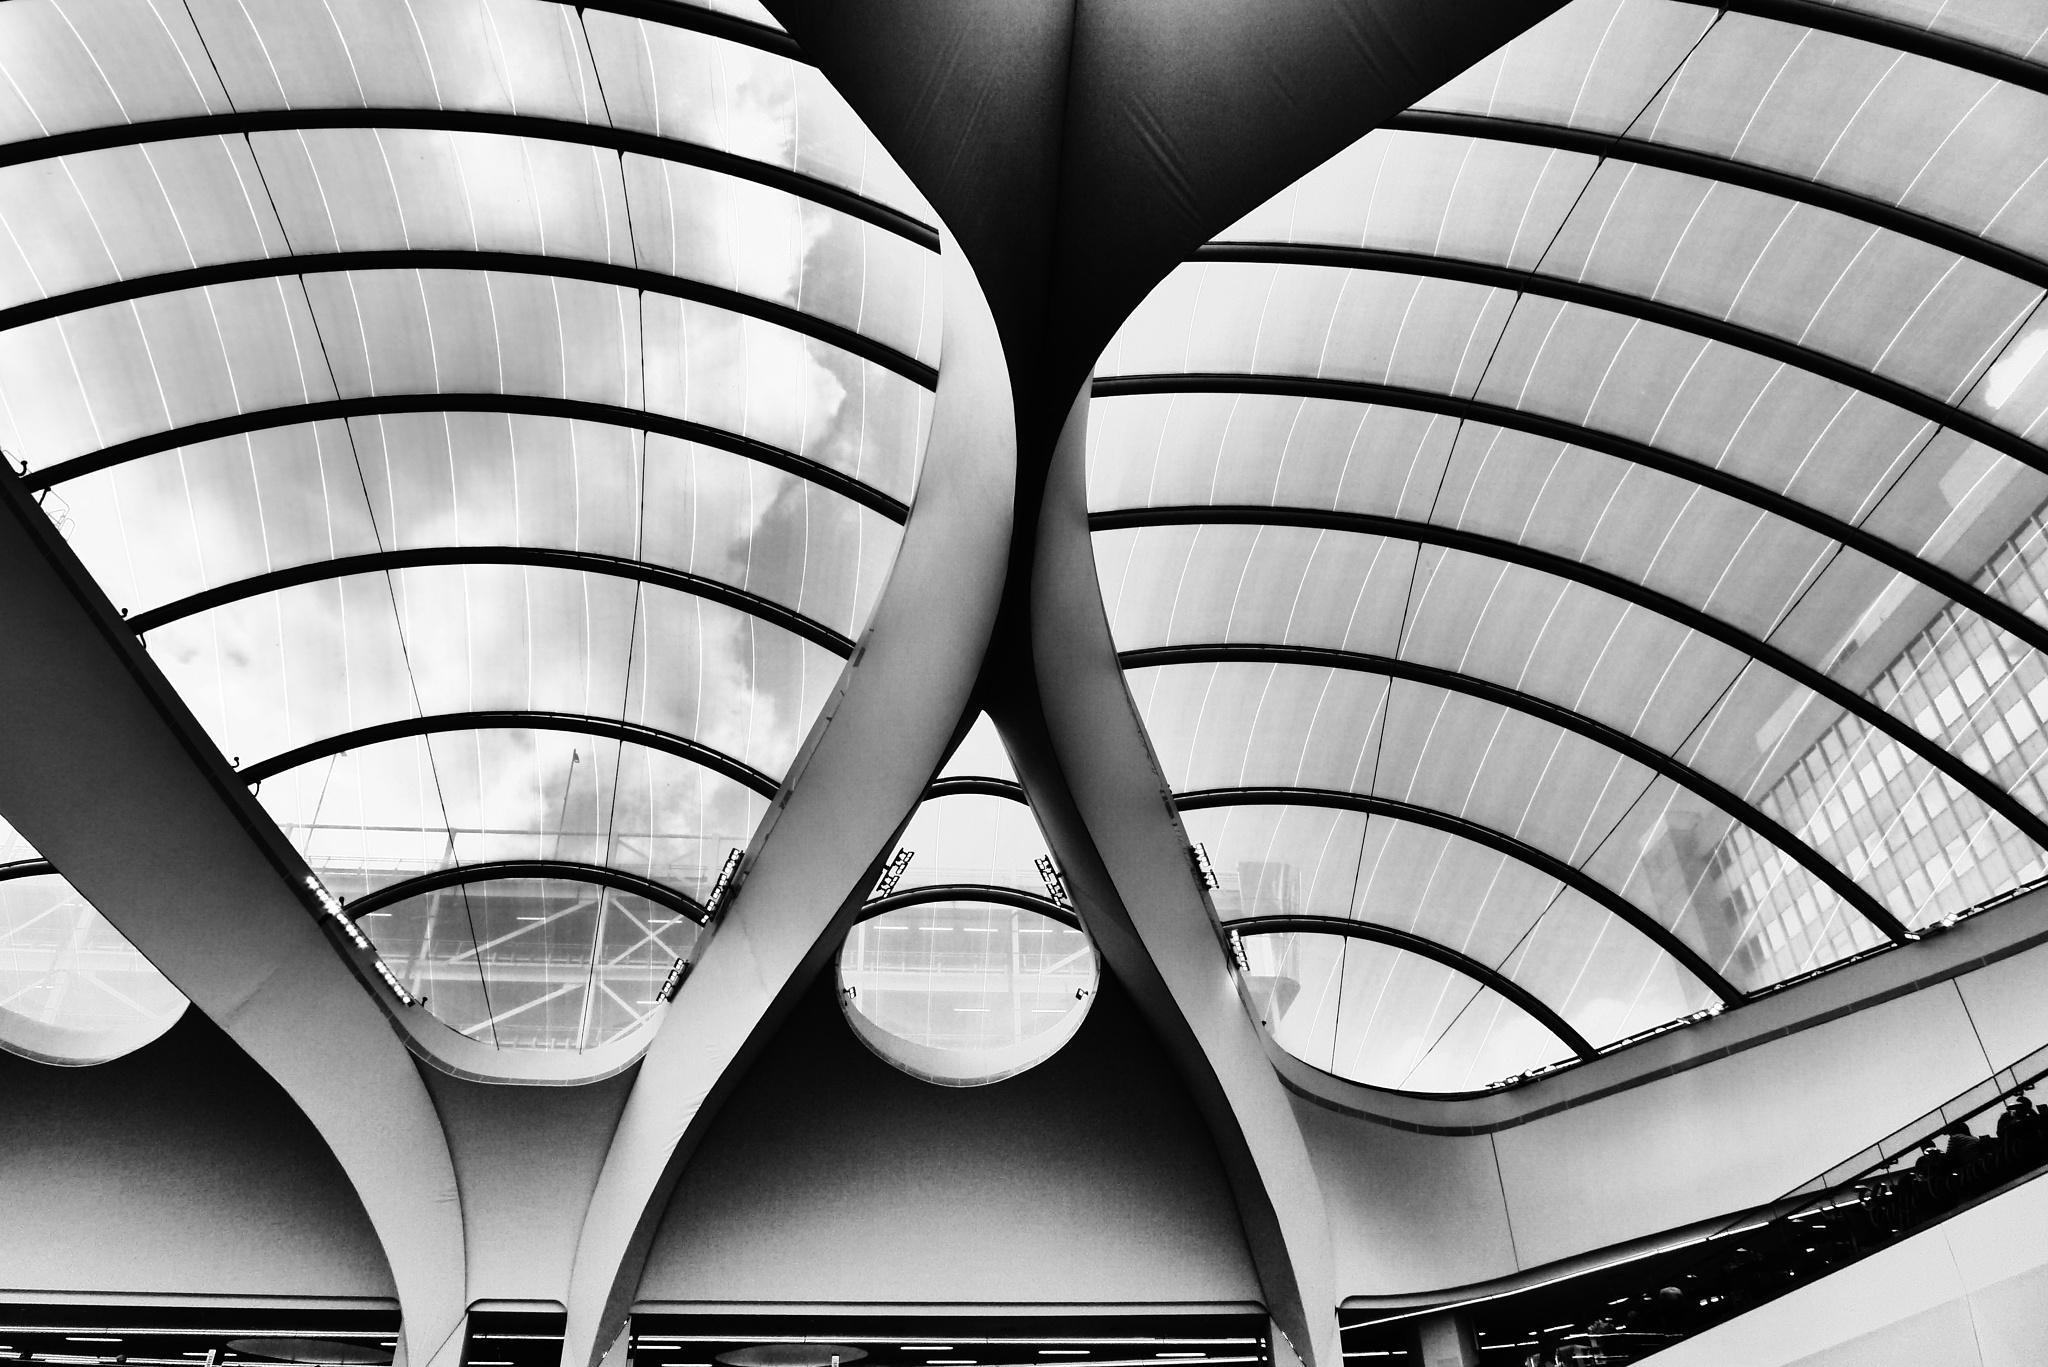 Alien roof by AJ Yakstrangler Andy Jamieson